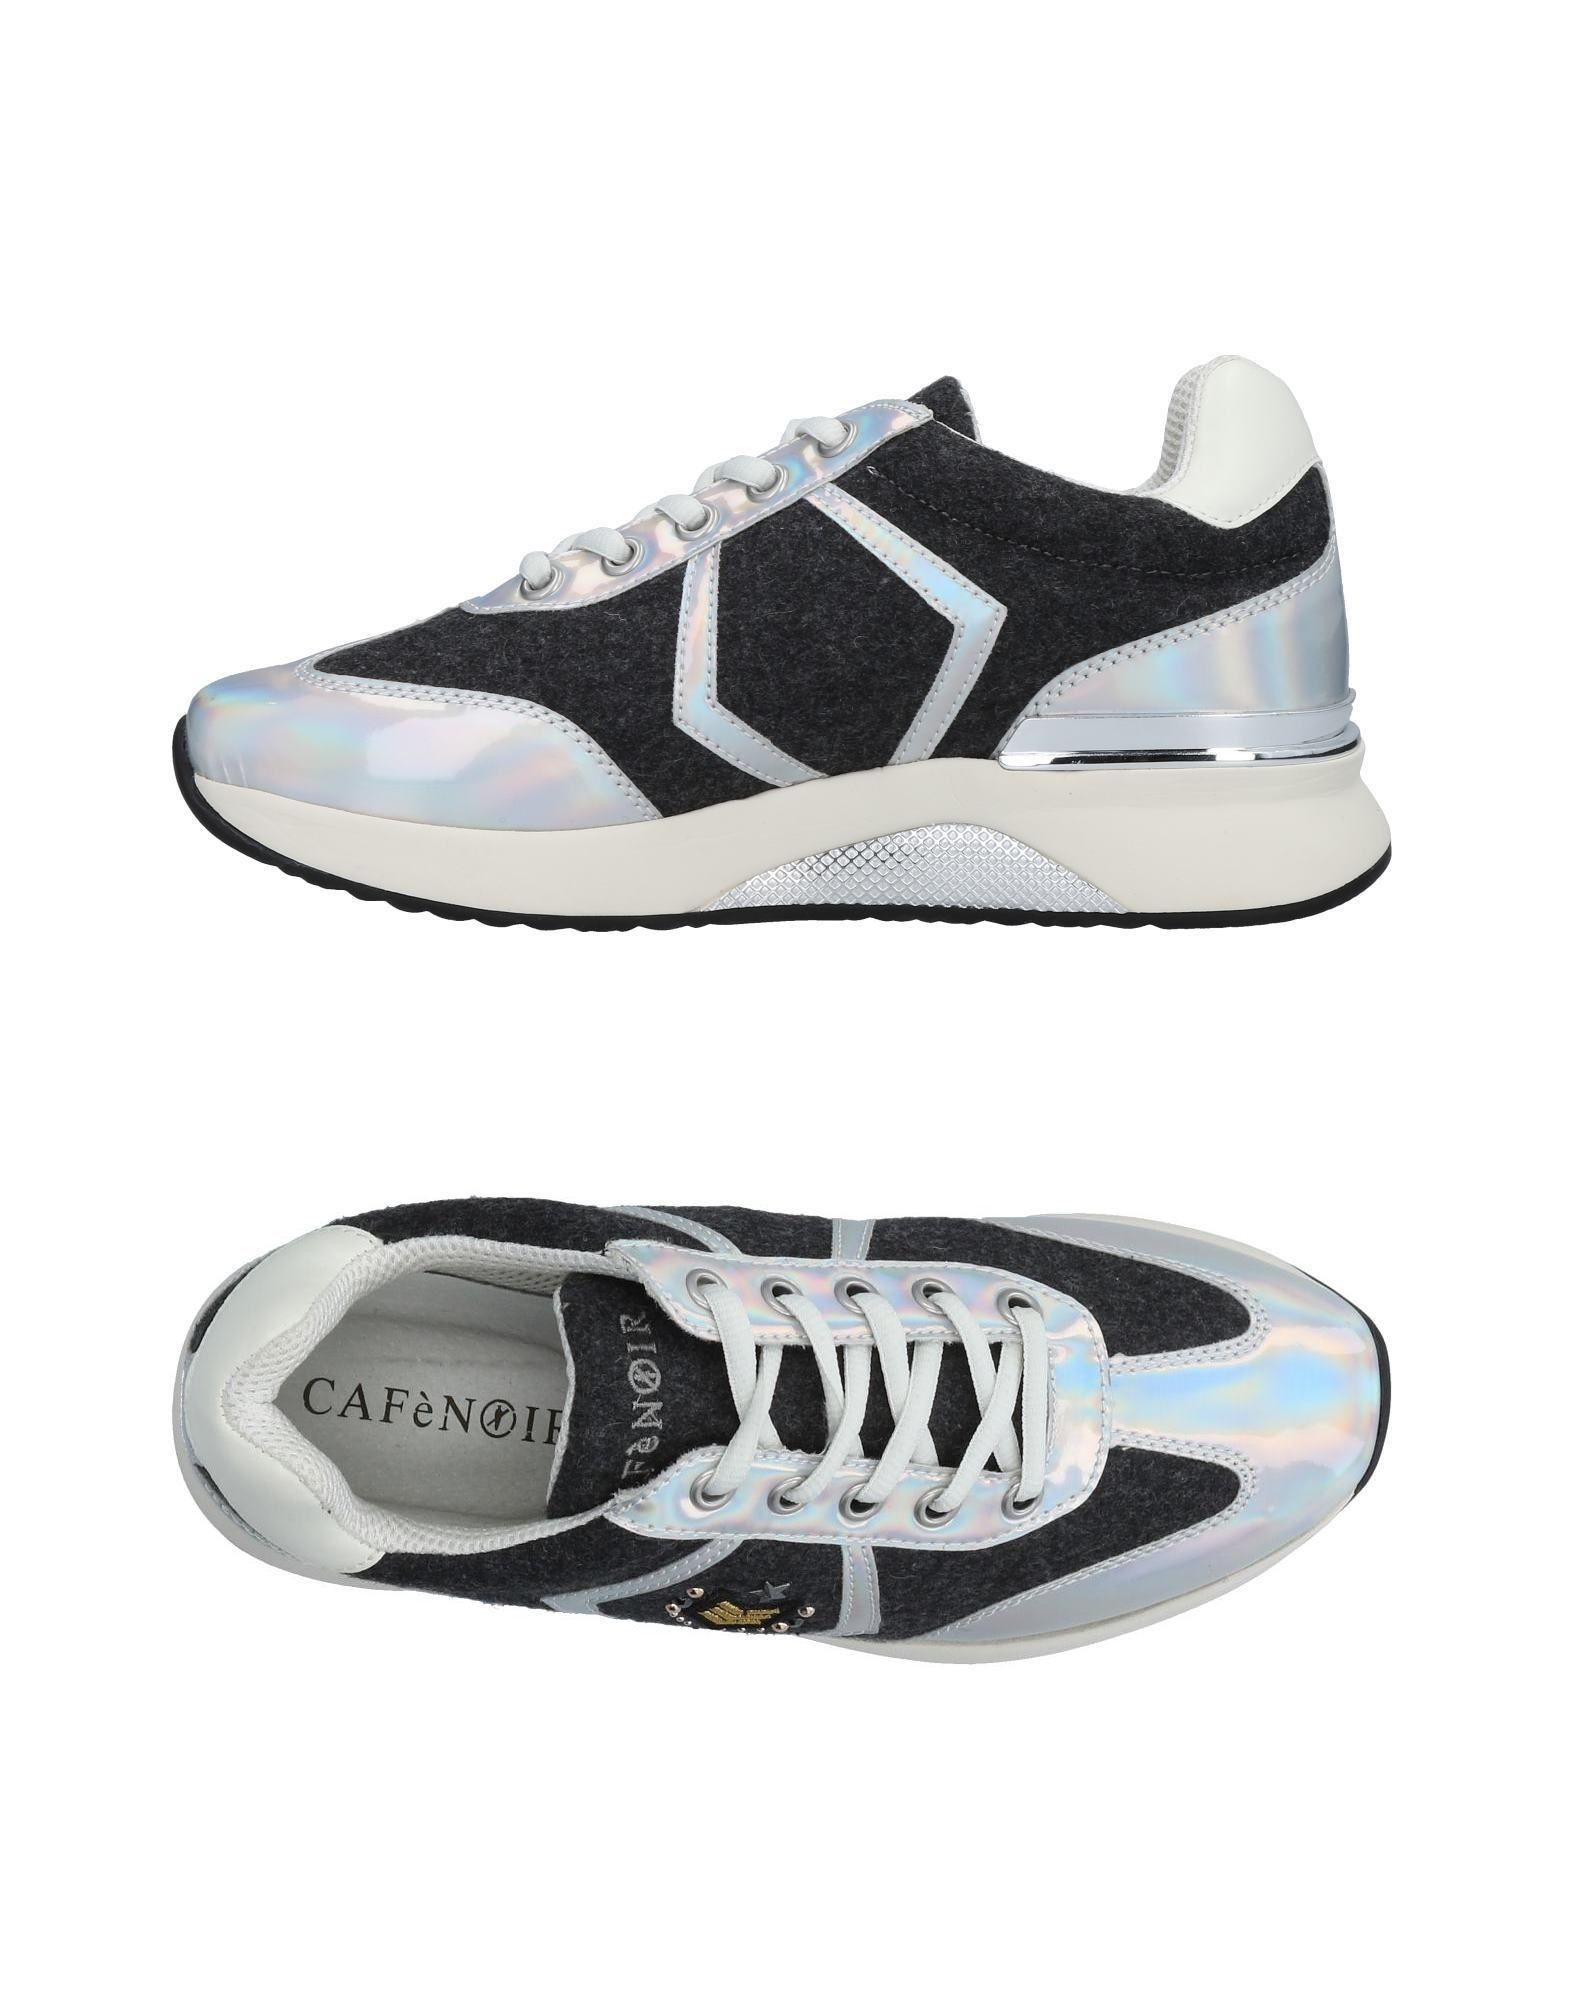 Moda 11478677PA Sneakers Cafènoir Donna - 11478677PA Moda 4852bd